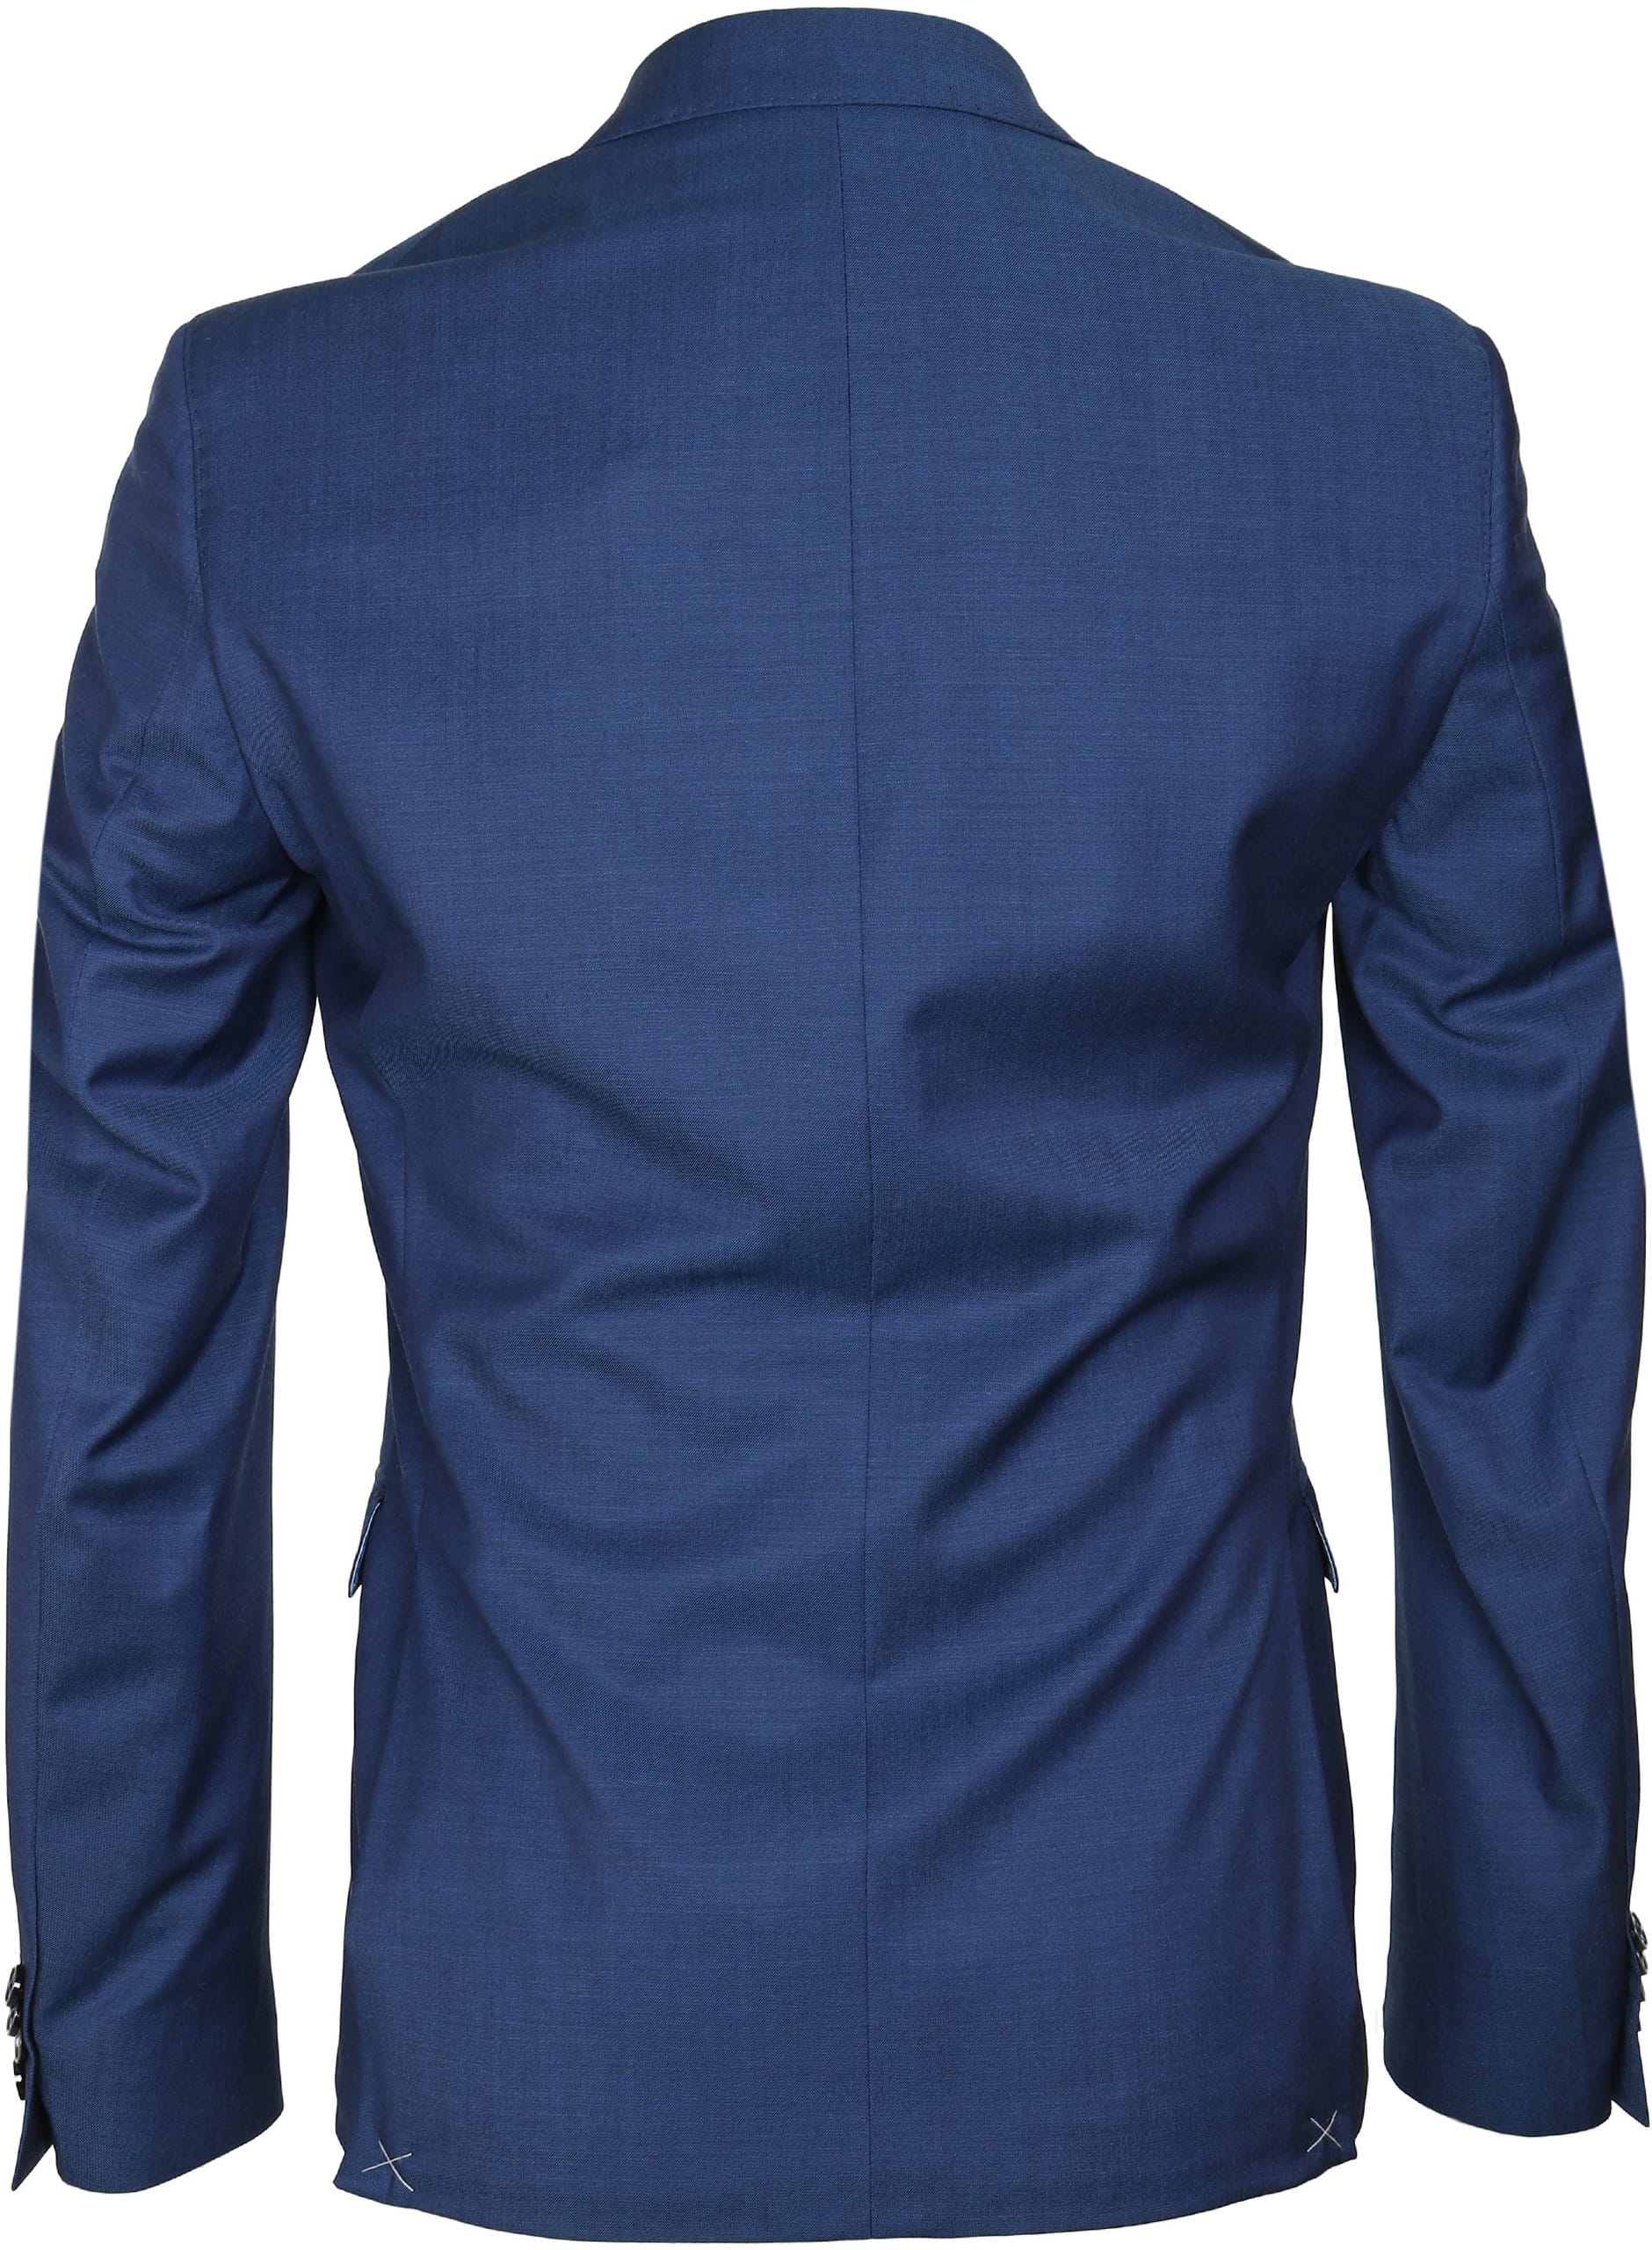 Suitable Anzug Strato Hellblau Navy foto 4